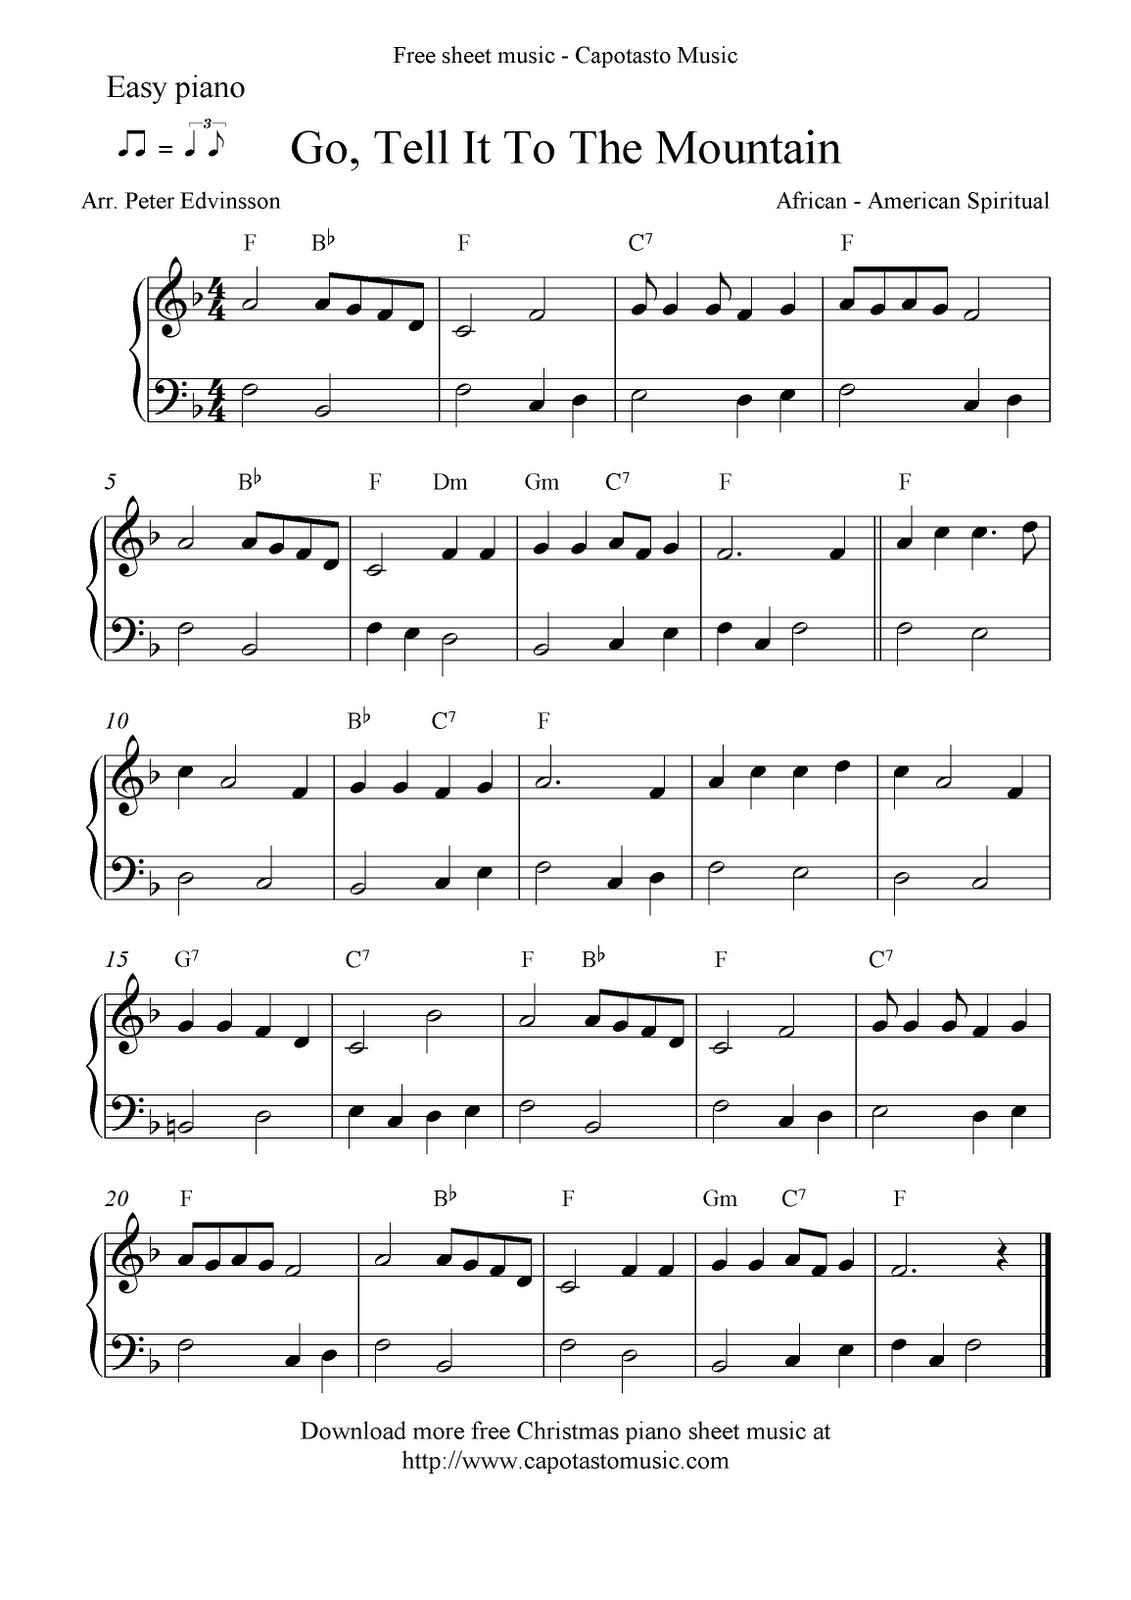 Free Printable Piano Sheet Music | Free Sheet Music Scores: Easy - Free Christmas Piano Sheet Music For Beginners Printable